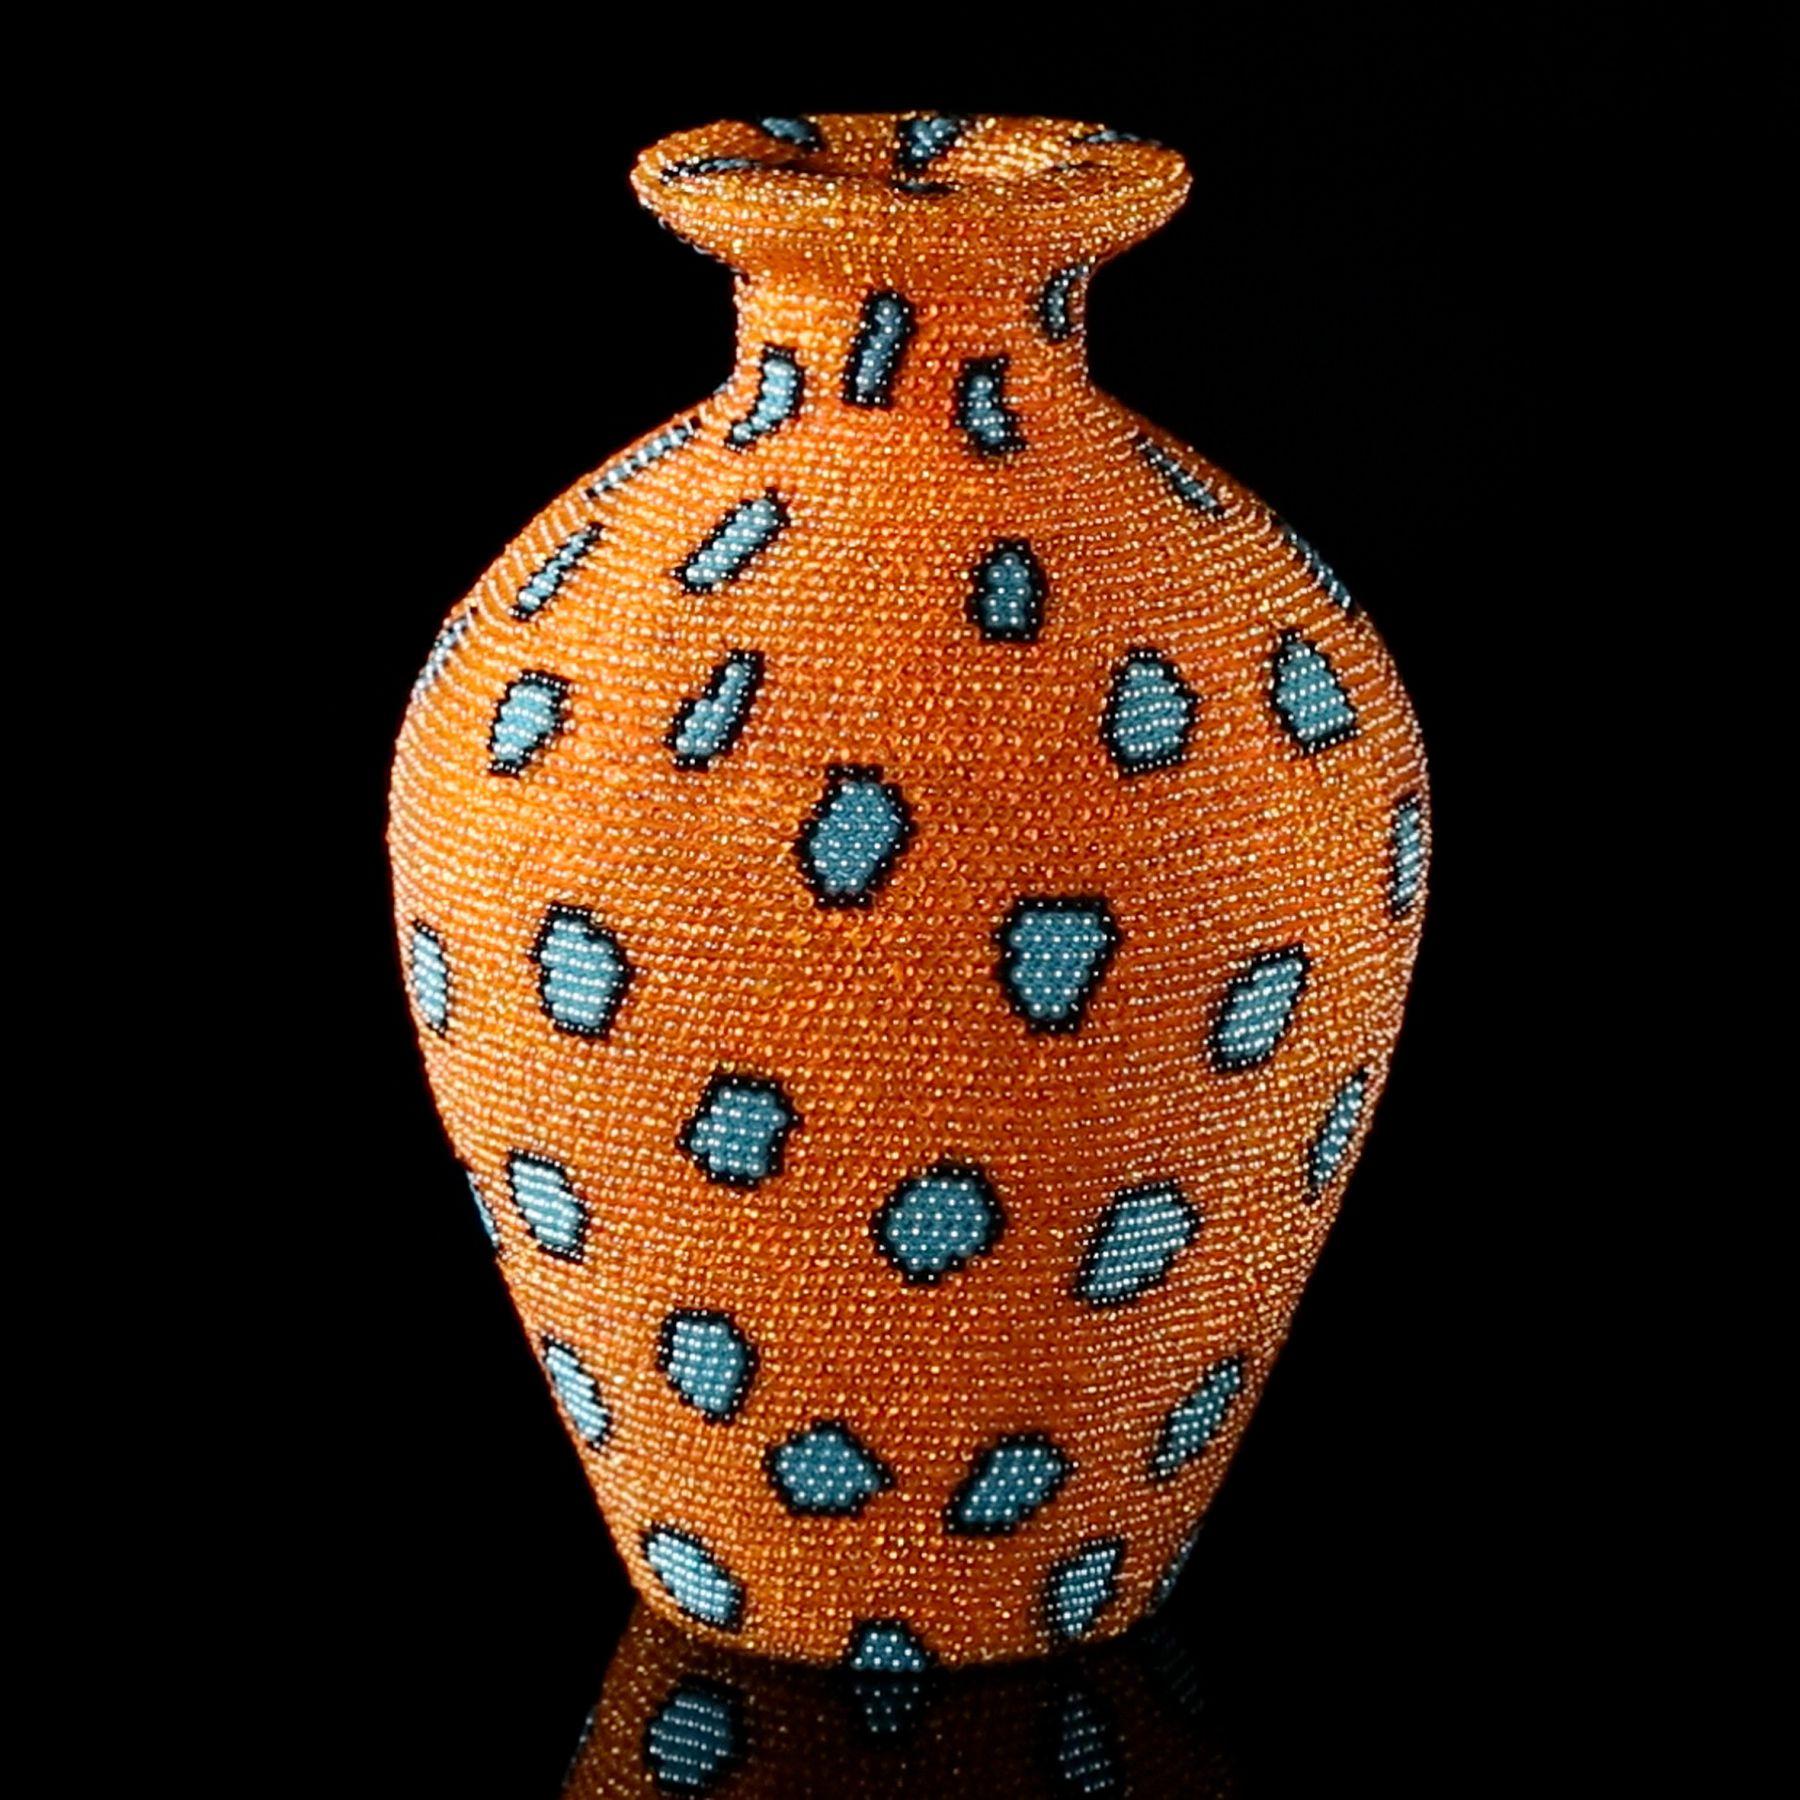 david mach, Coral Orange, 2012, plastic ball pins on foam, 12 x 8 1/4 x 8 1/4 inches